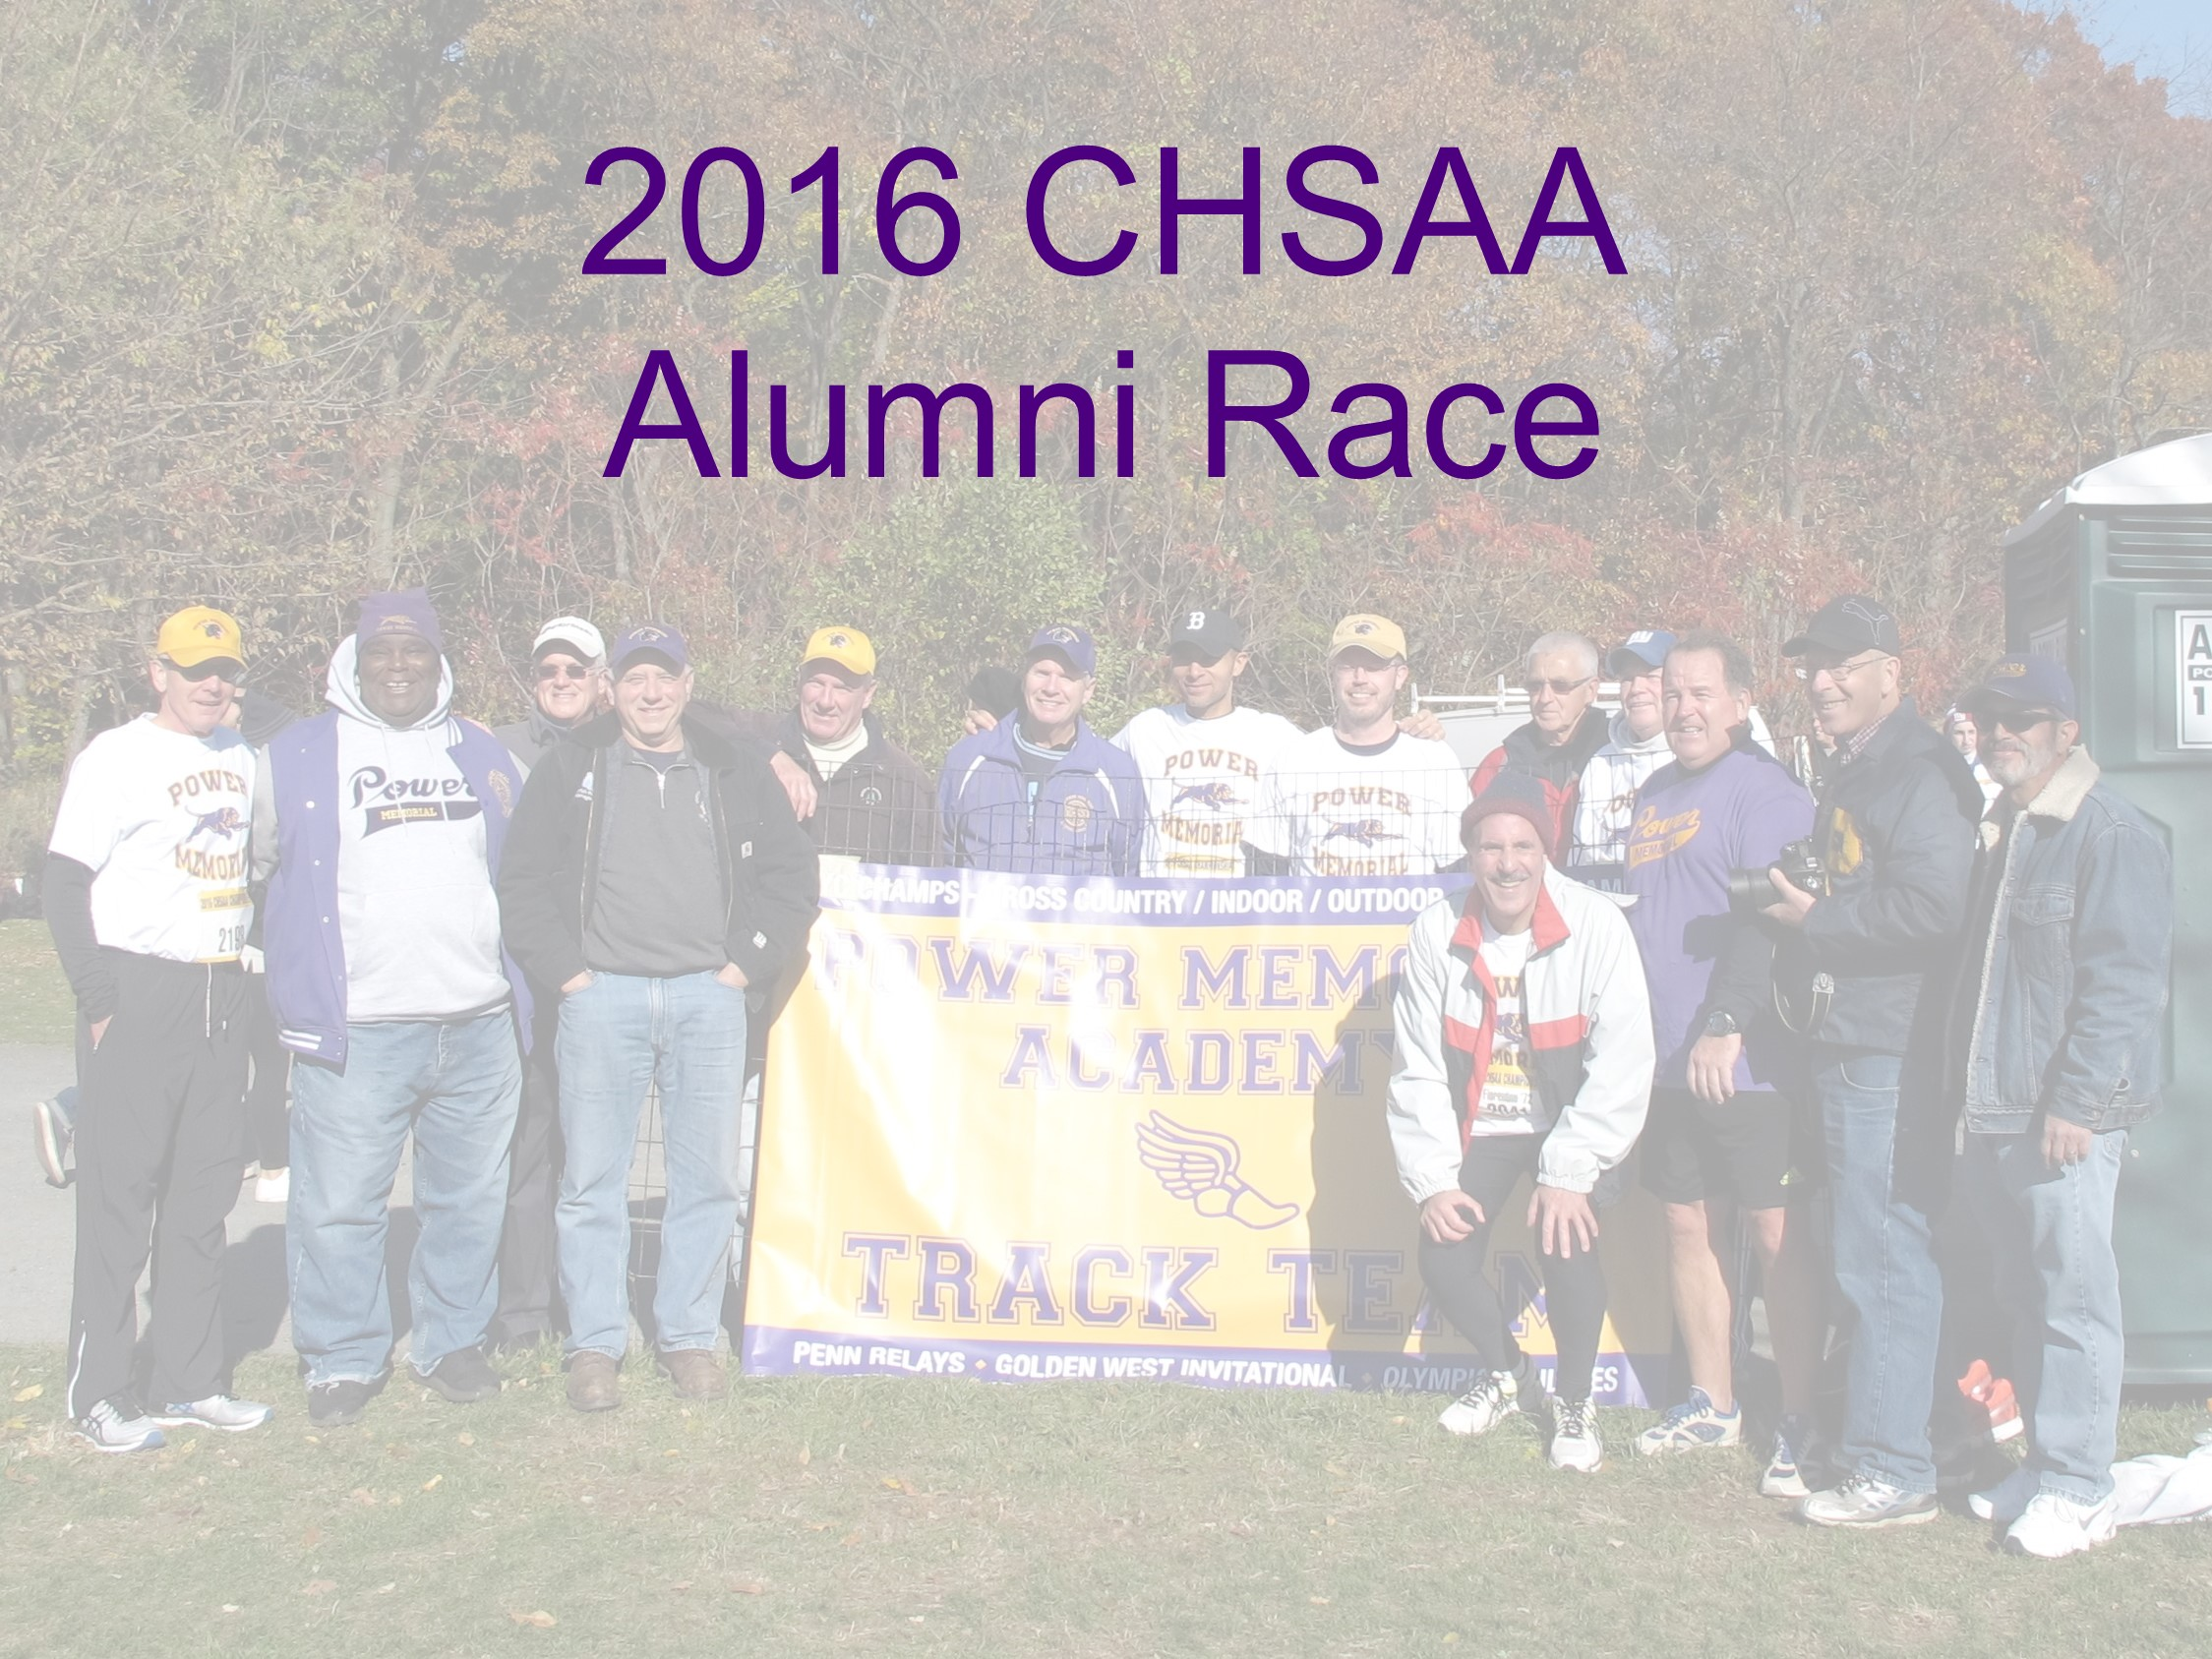 2016 Alumni Race Cover Image